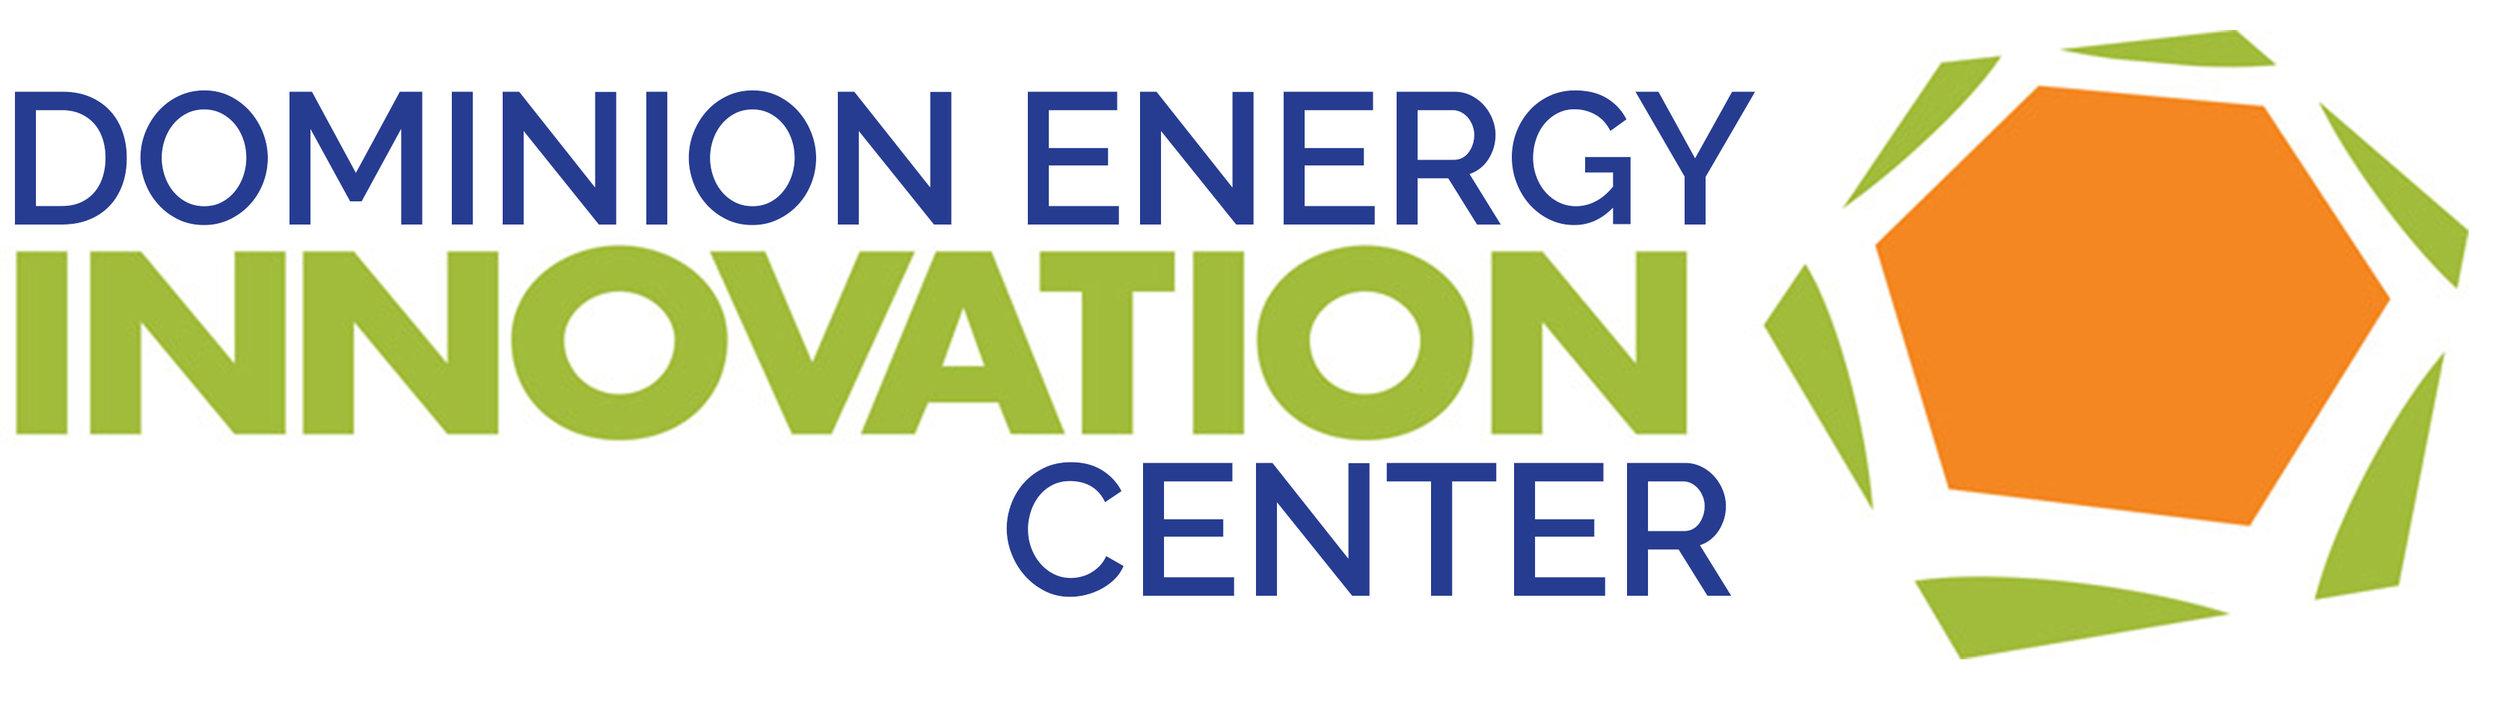 Dominion Energy Innovation Center logo.jpg